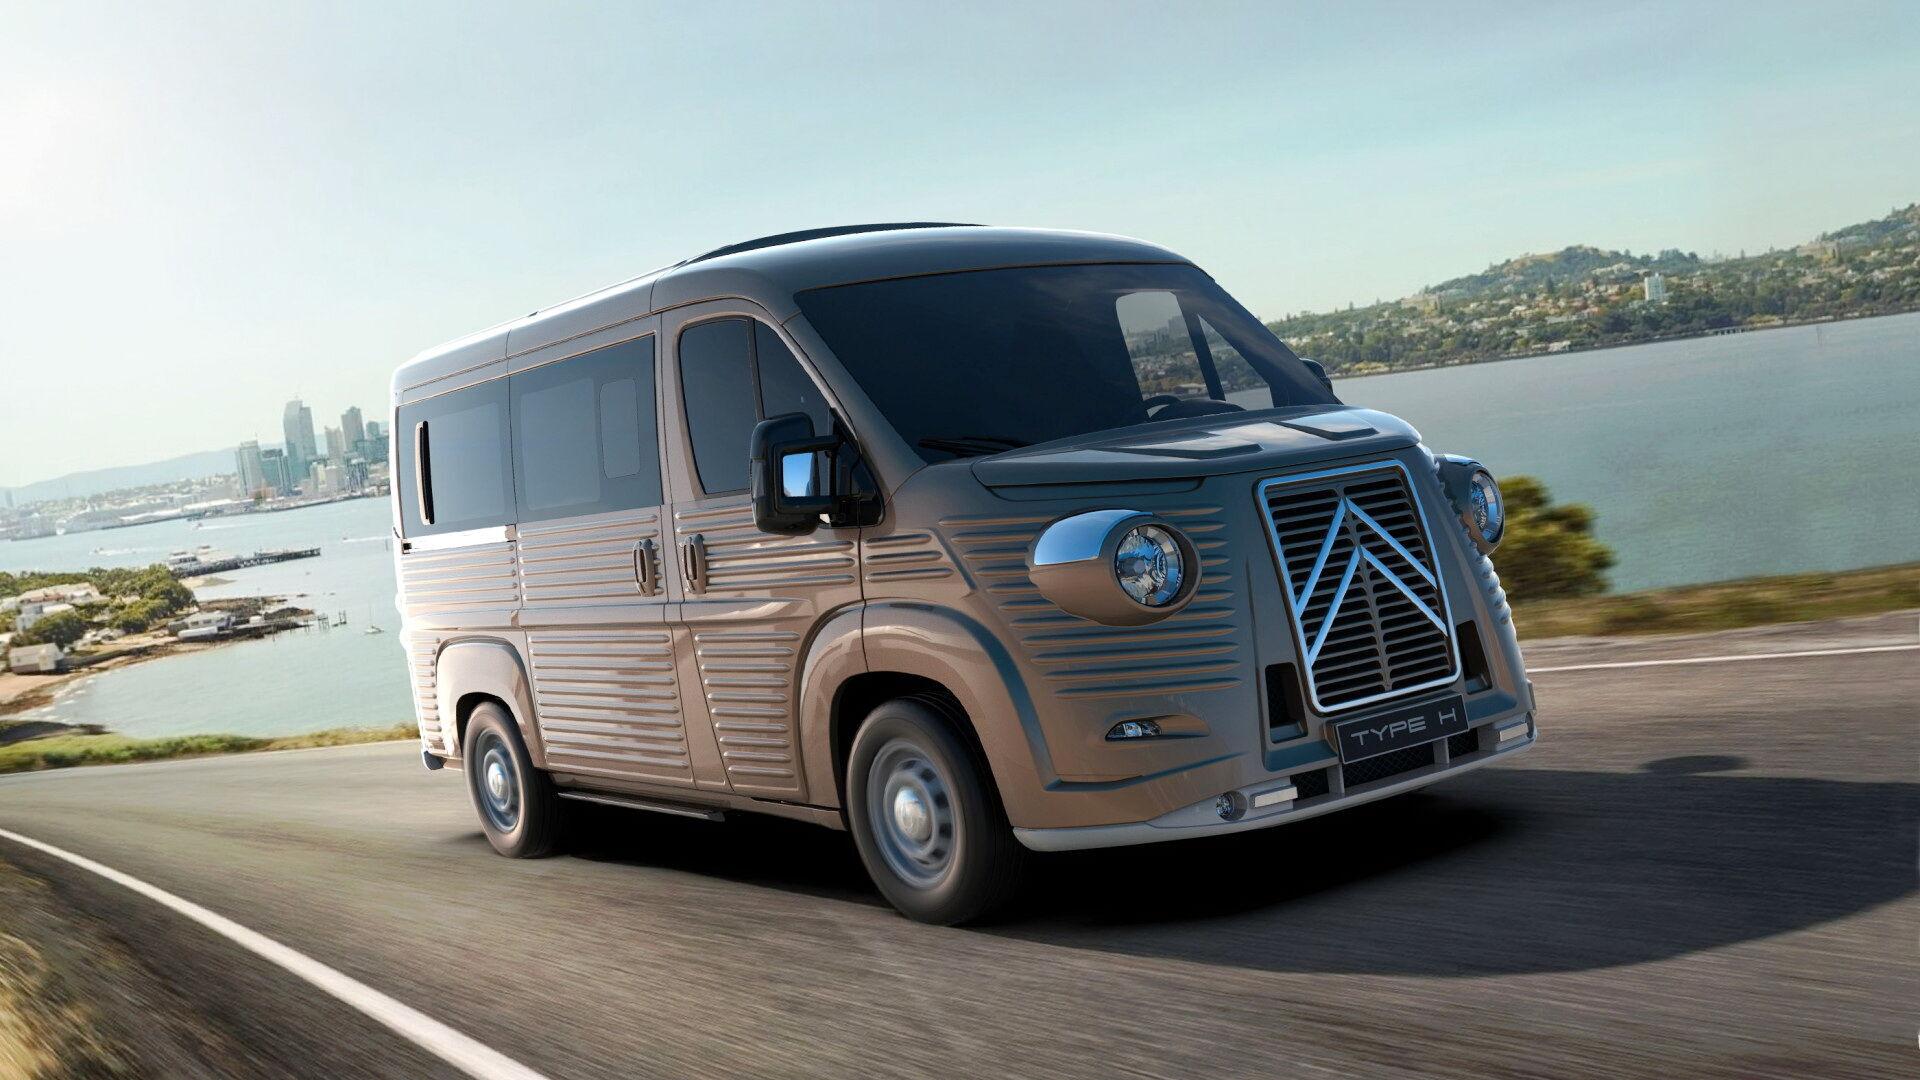 Мікроавтобус Carrosserie Caselani Type H. Фото: